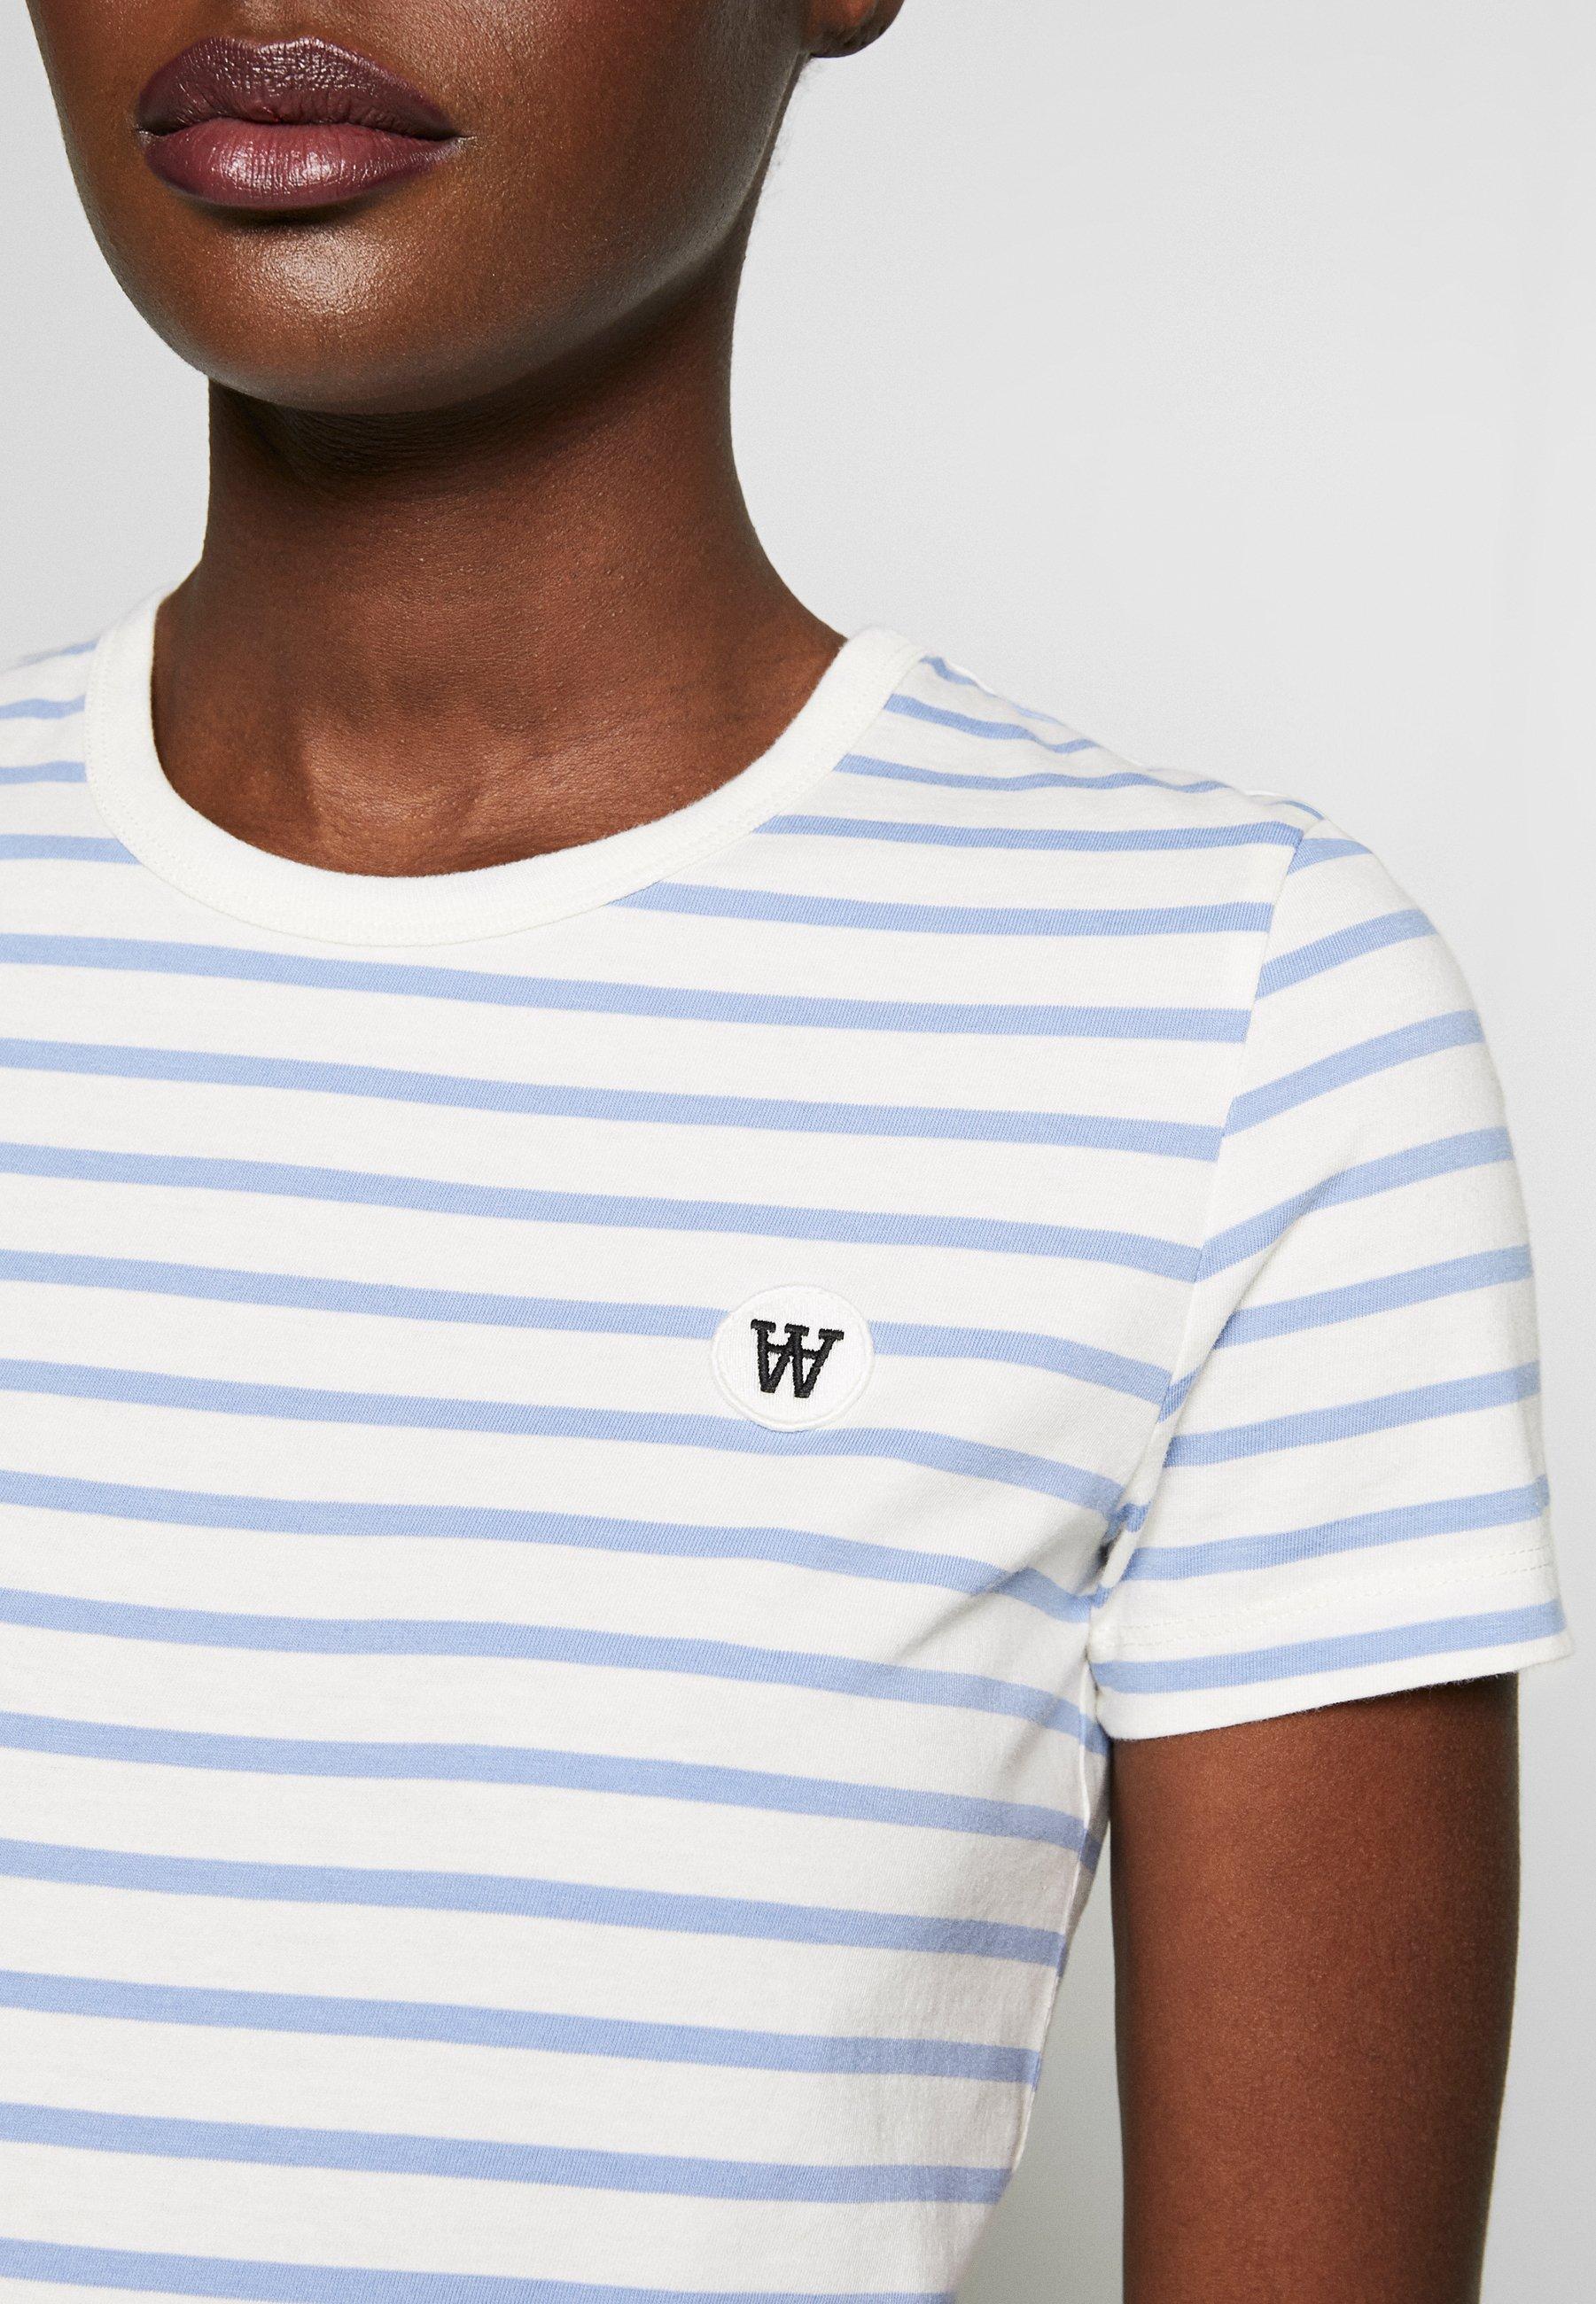 Wood Uma - T-shirt Med Print Off-white/blue Stripes